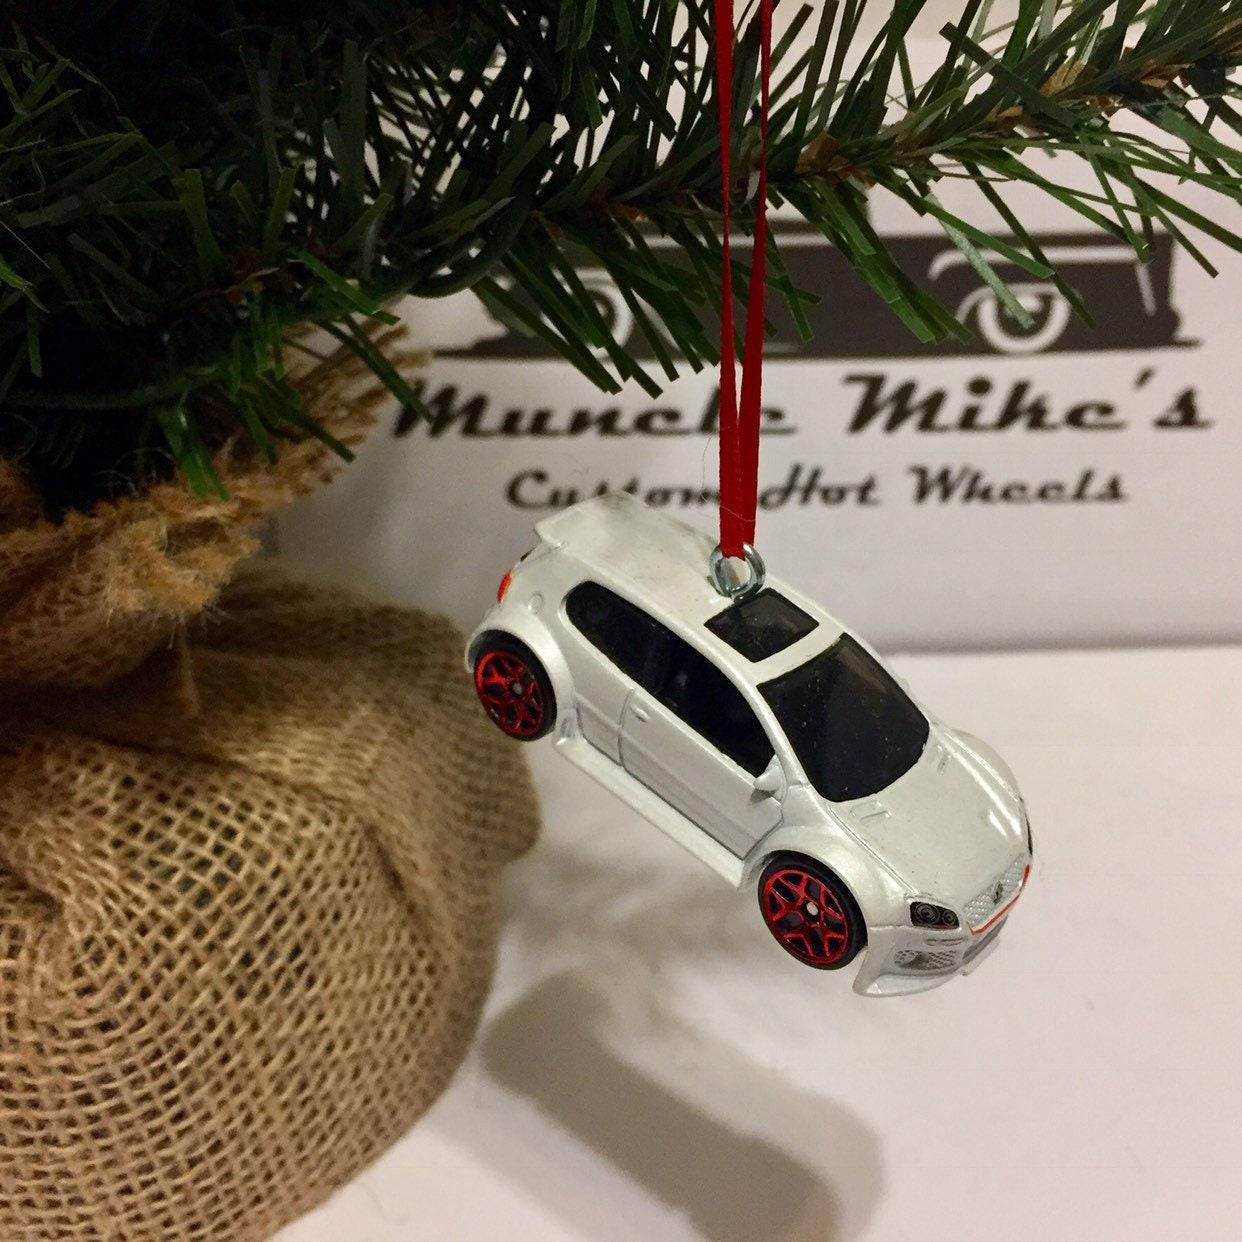 Hot Wheels Christmas Ornament Custom 2008  White Volkswagen VW Golf GTI Christmas Ornament